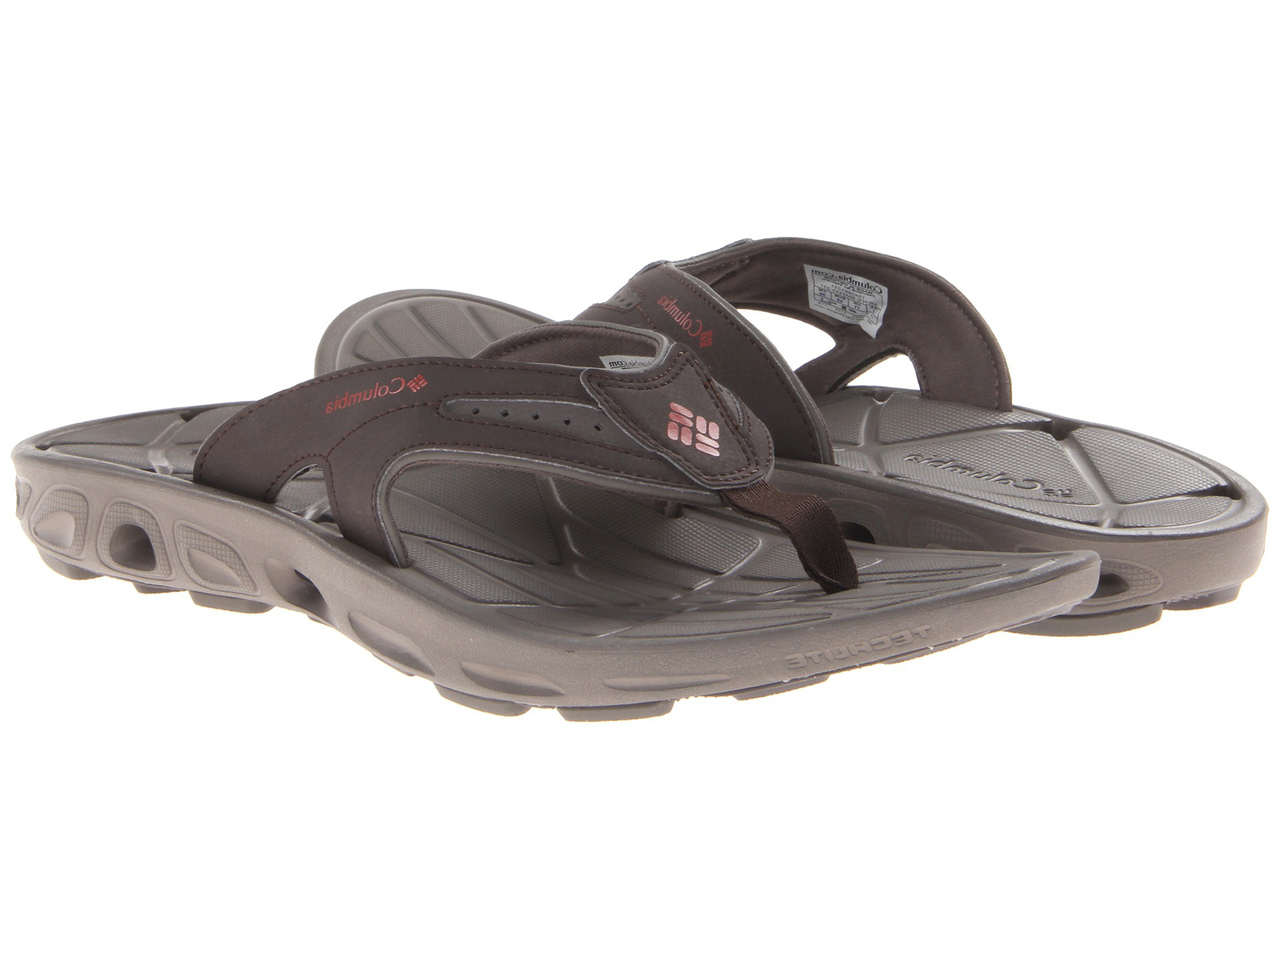 e550a6aa6168 Columbia Men s Techsun Vent Flip Sandals Cordovan Gypsy - Shop now    Shoolu.com